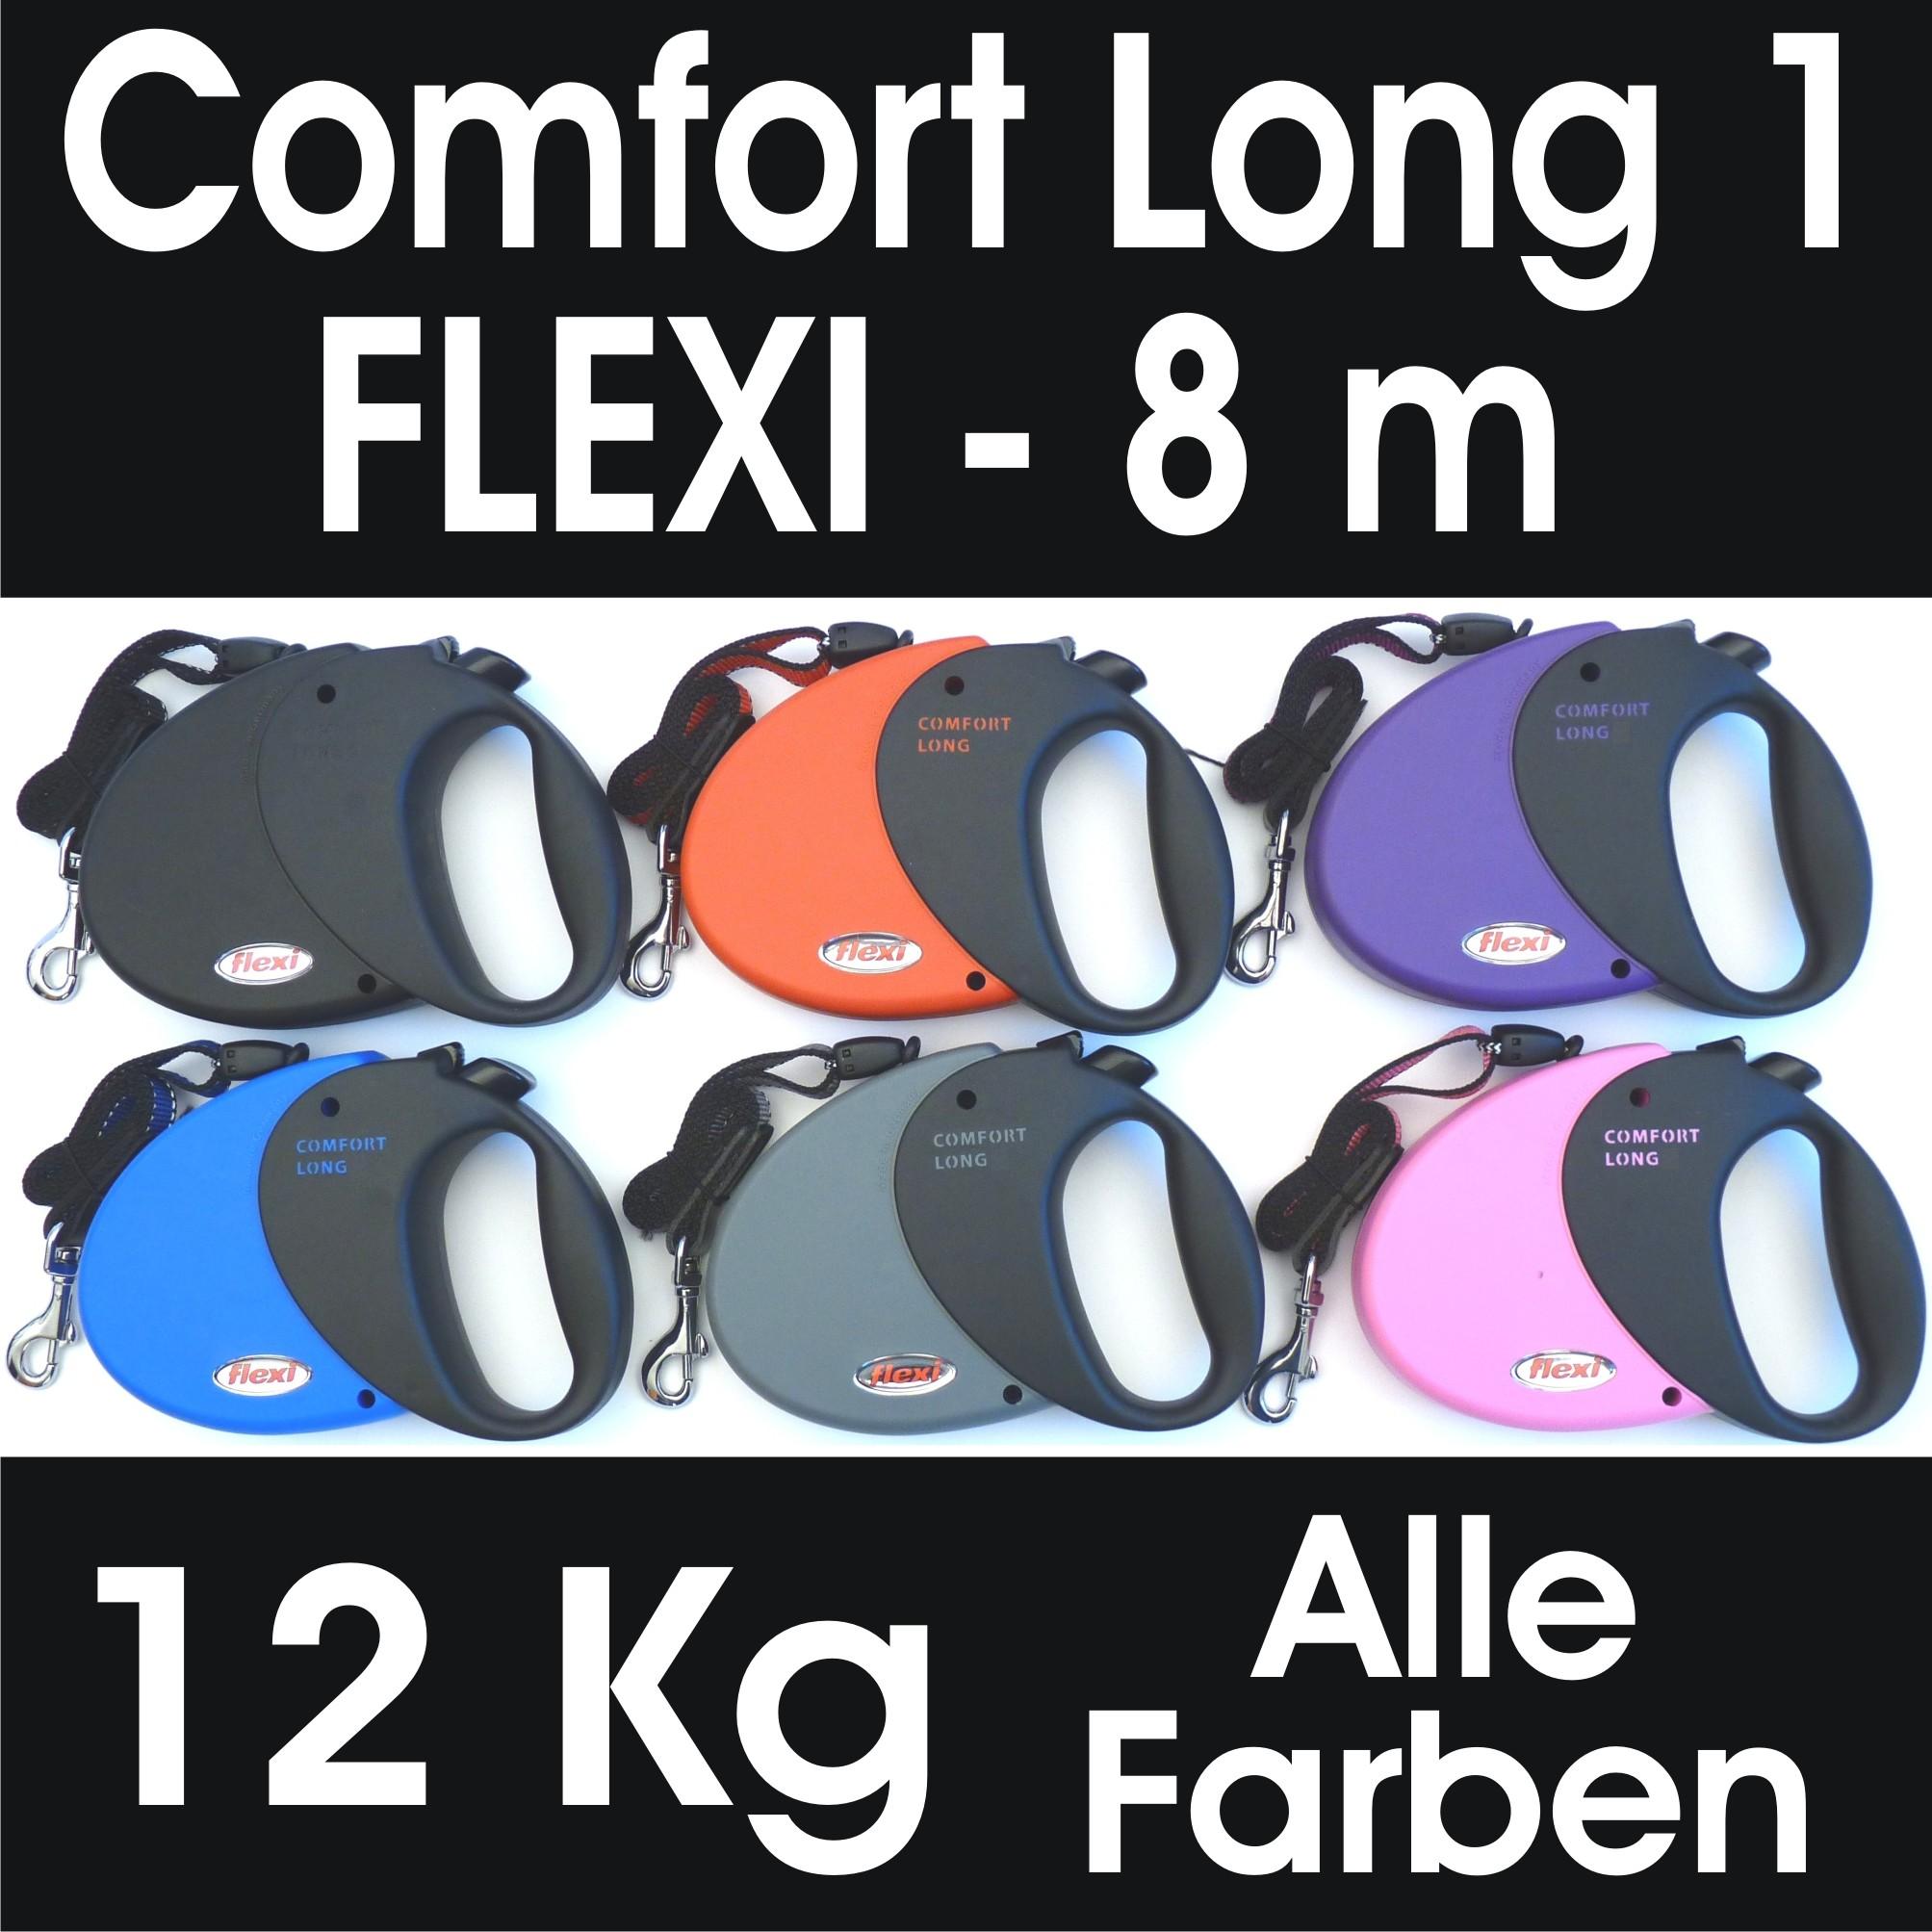 ComfortLong2